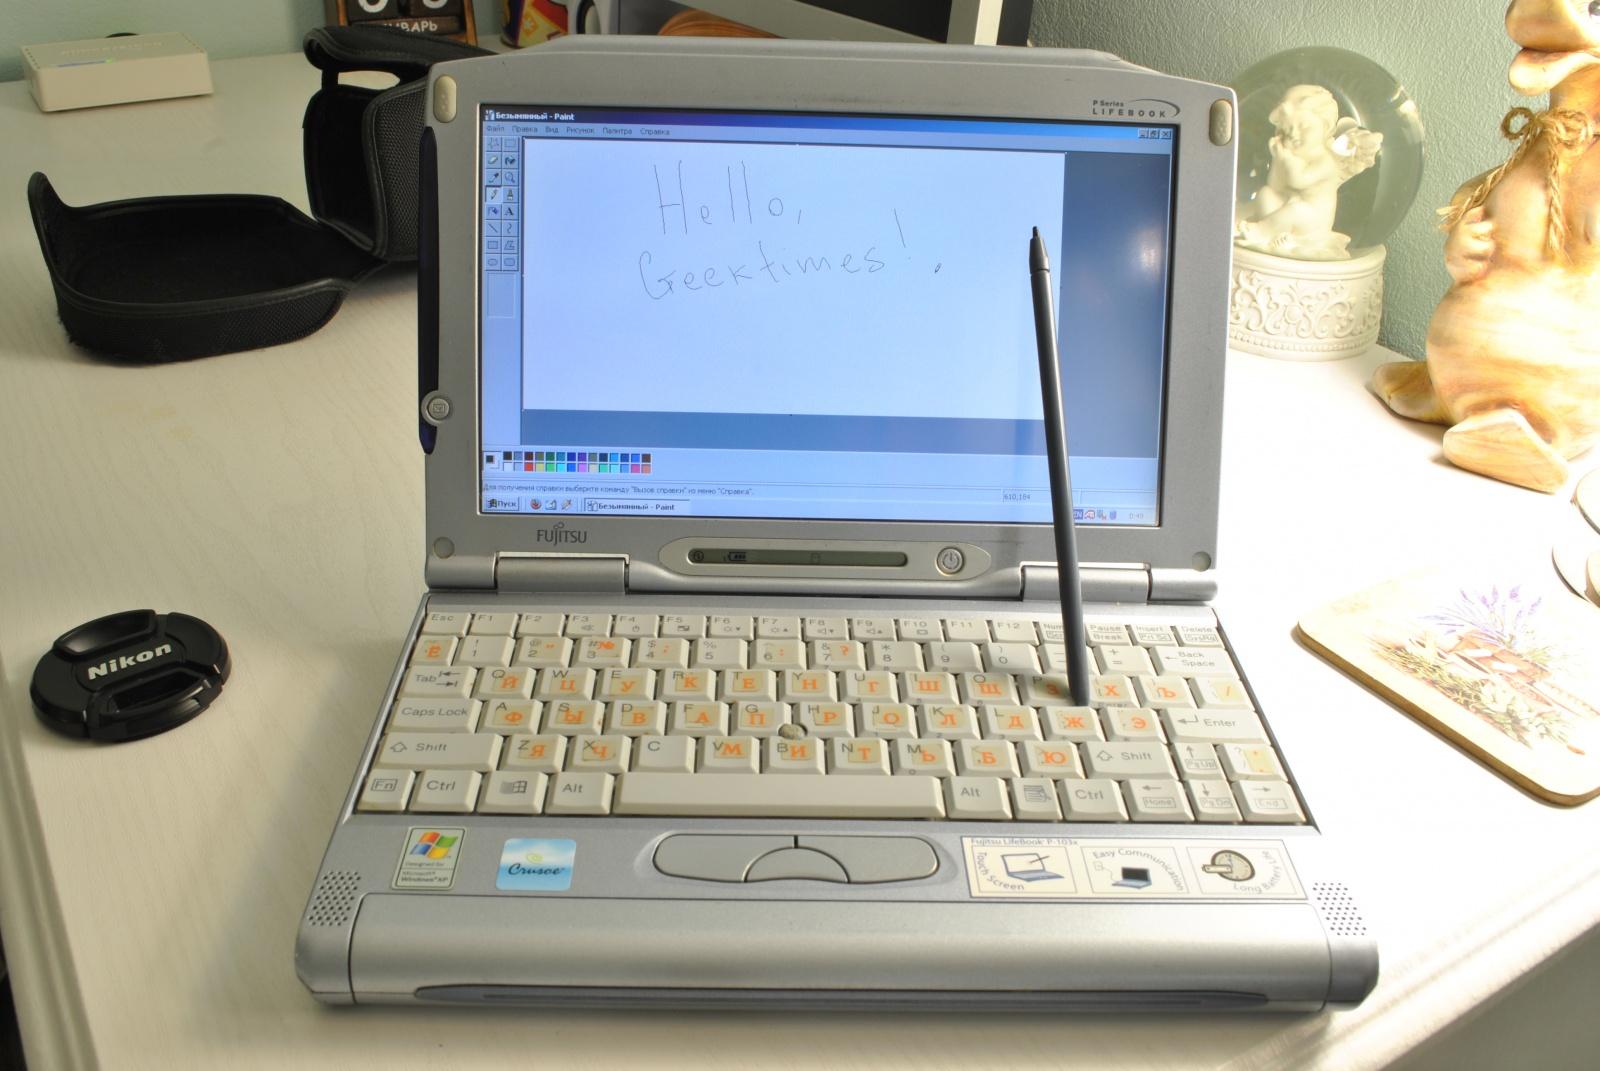 Ультрабук начала 2000-х – обзор Fujitsu LifeBook P-1032 - 1